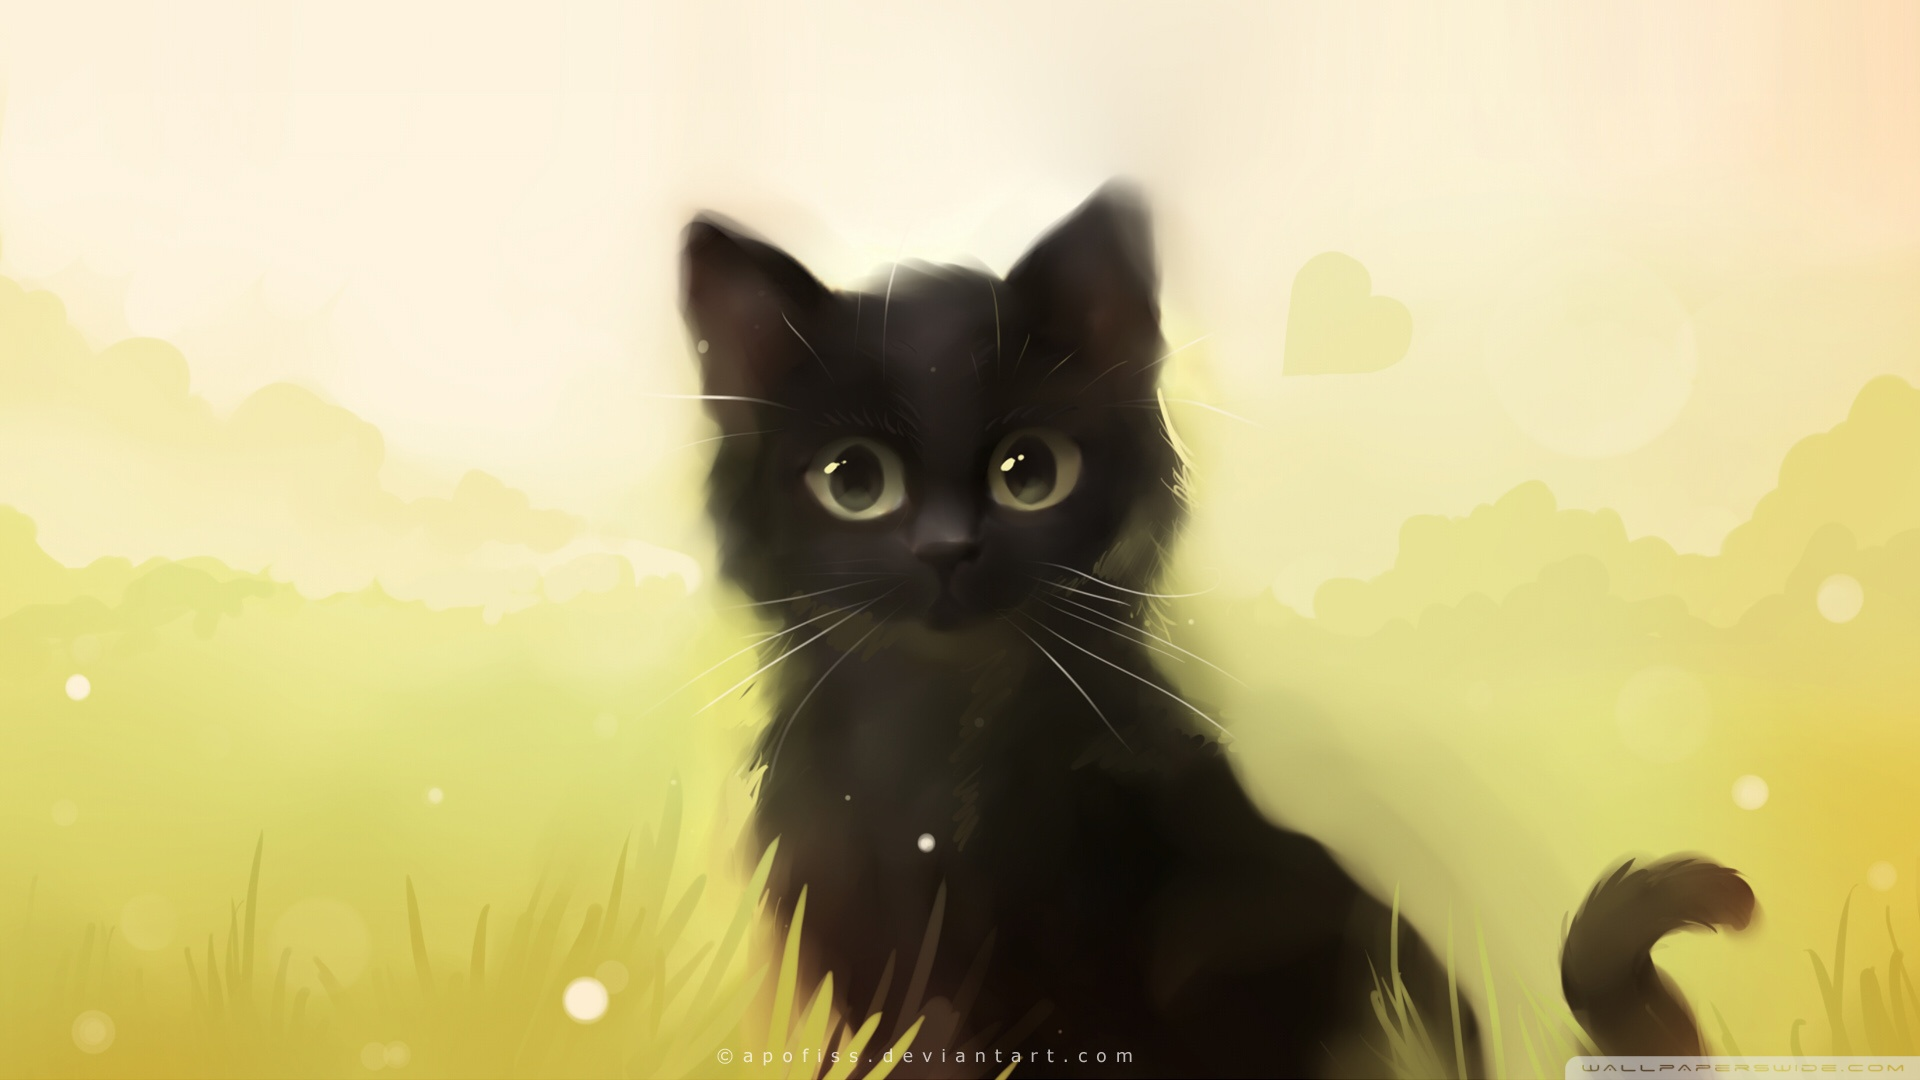 Black Cat Desktop Wallpaper Posted By Ryan Cunningham